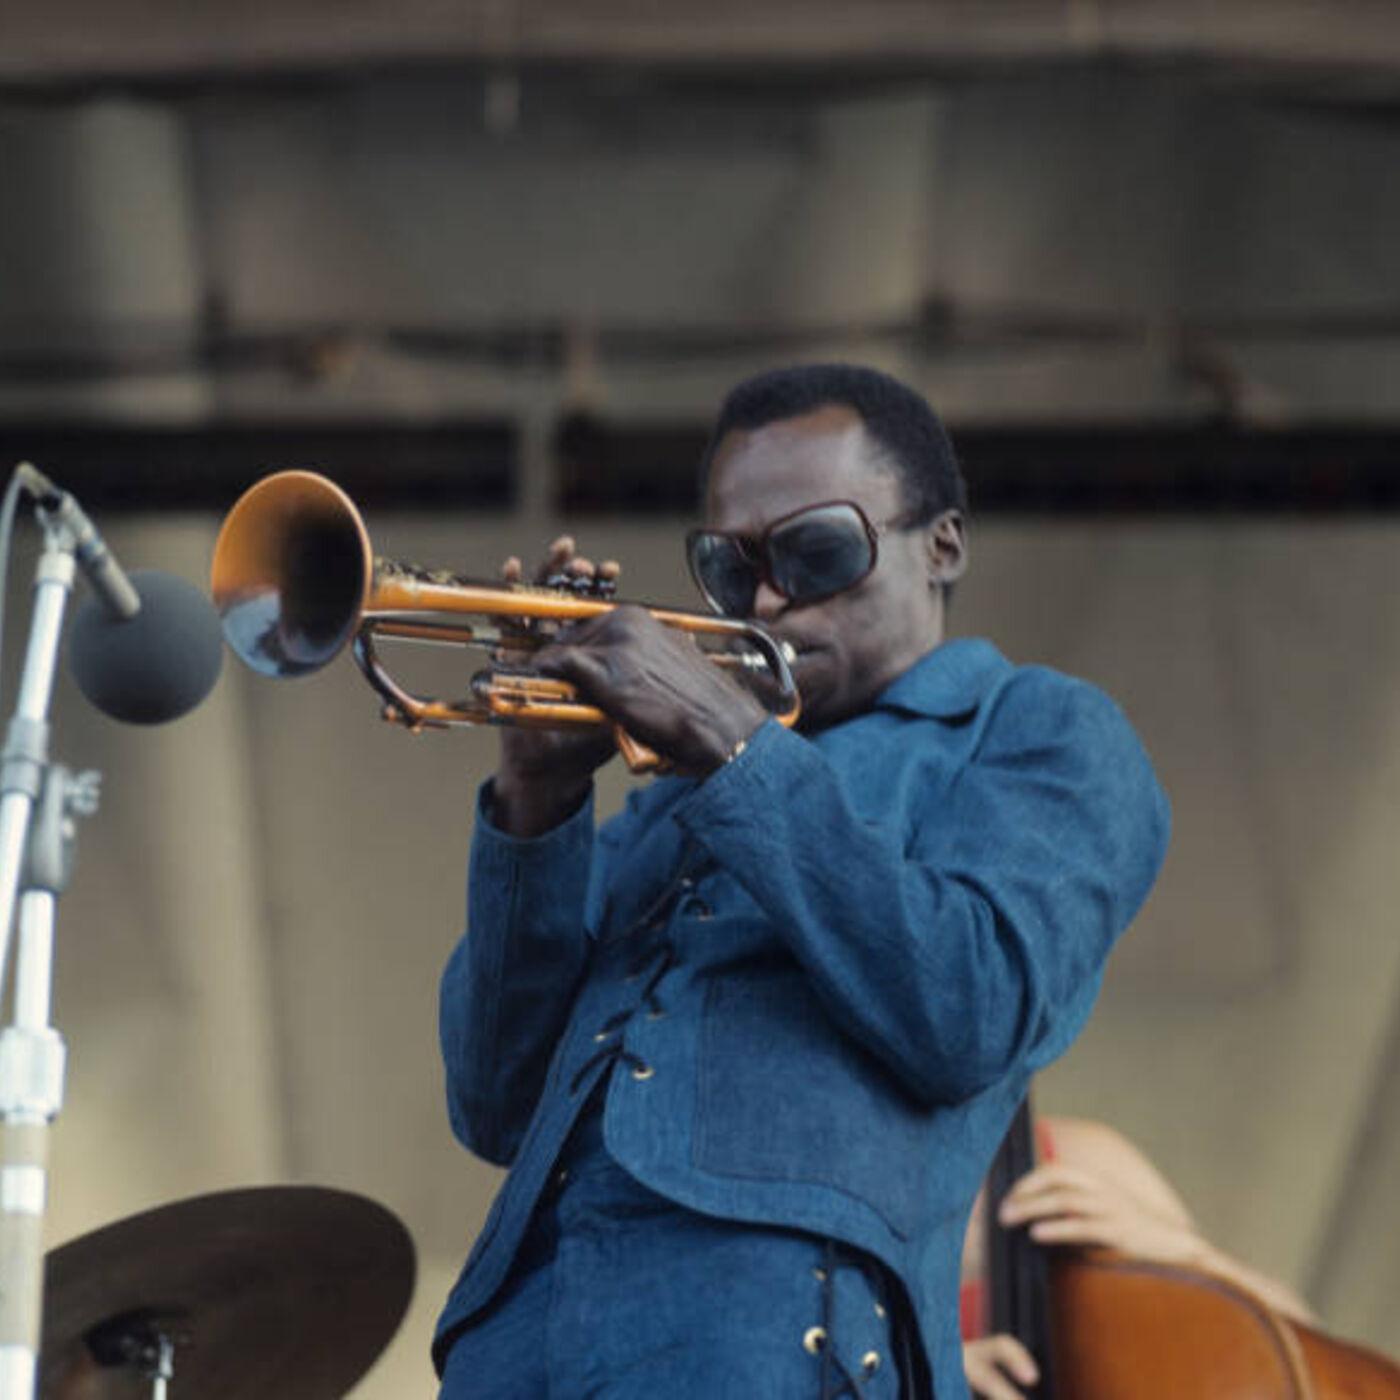 Episode 25 - Meeting Miles Davis